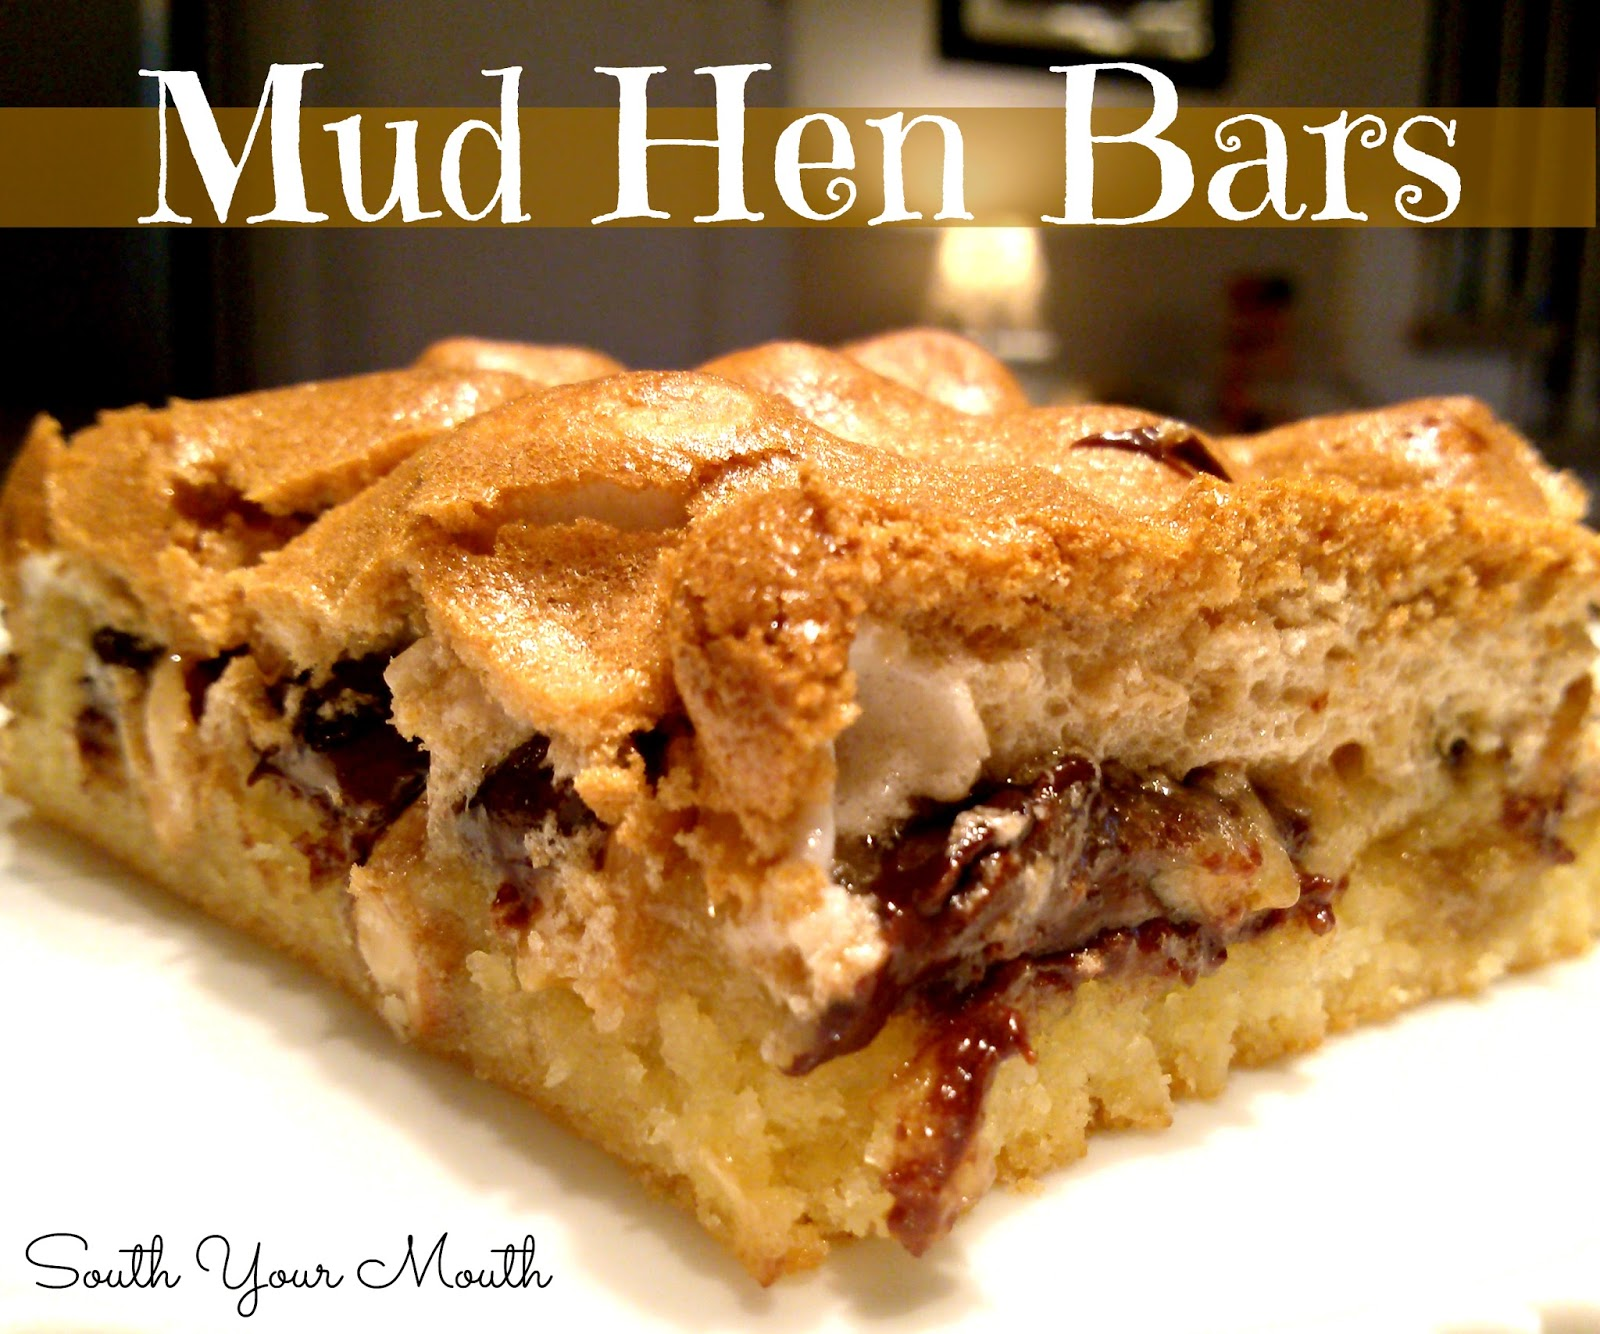 Mud Hen Bars Recipes — Dishmaps